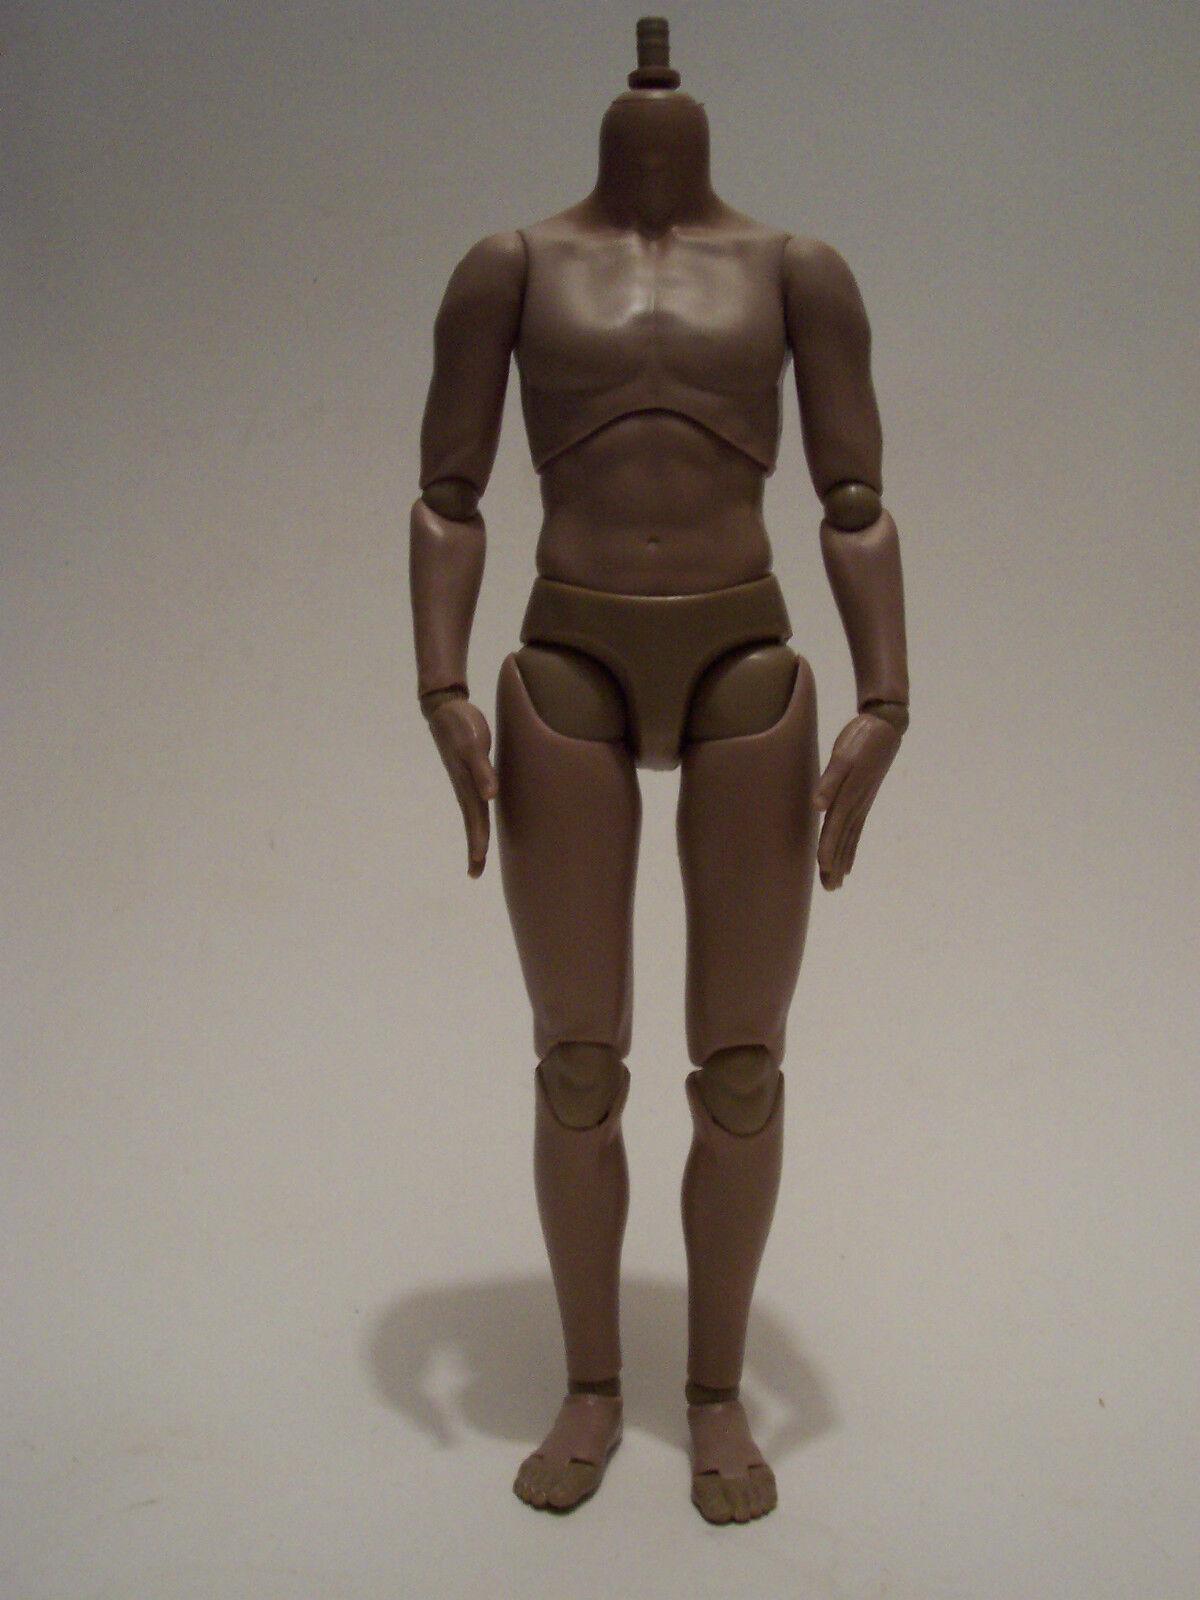 Enterbay rm - 1 1 6 scale  nude  mr. bean  figure body  neue<